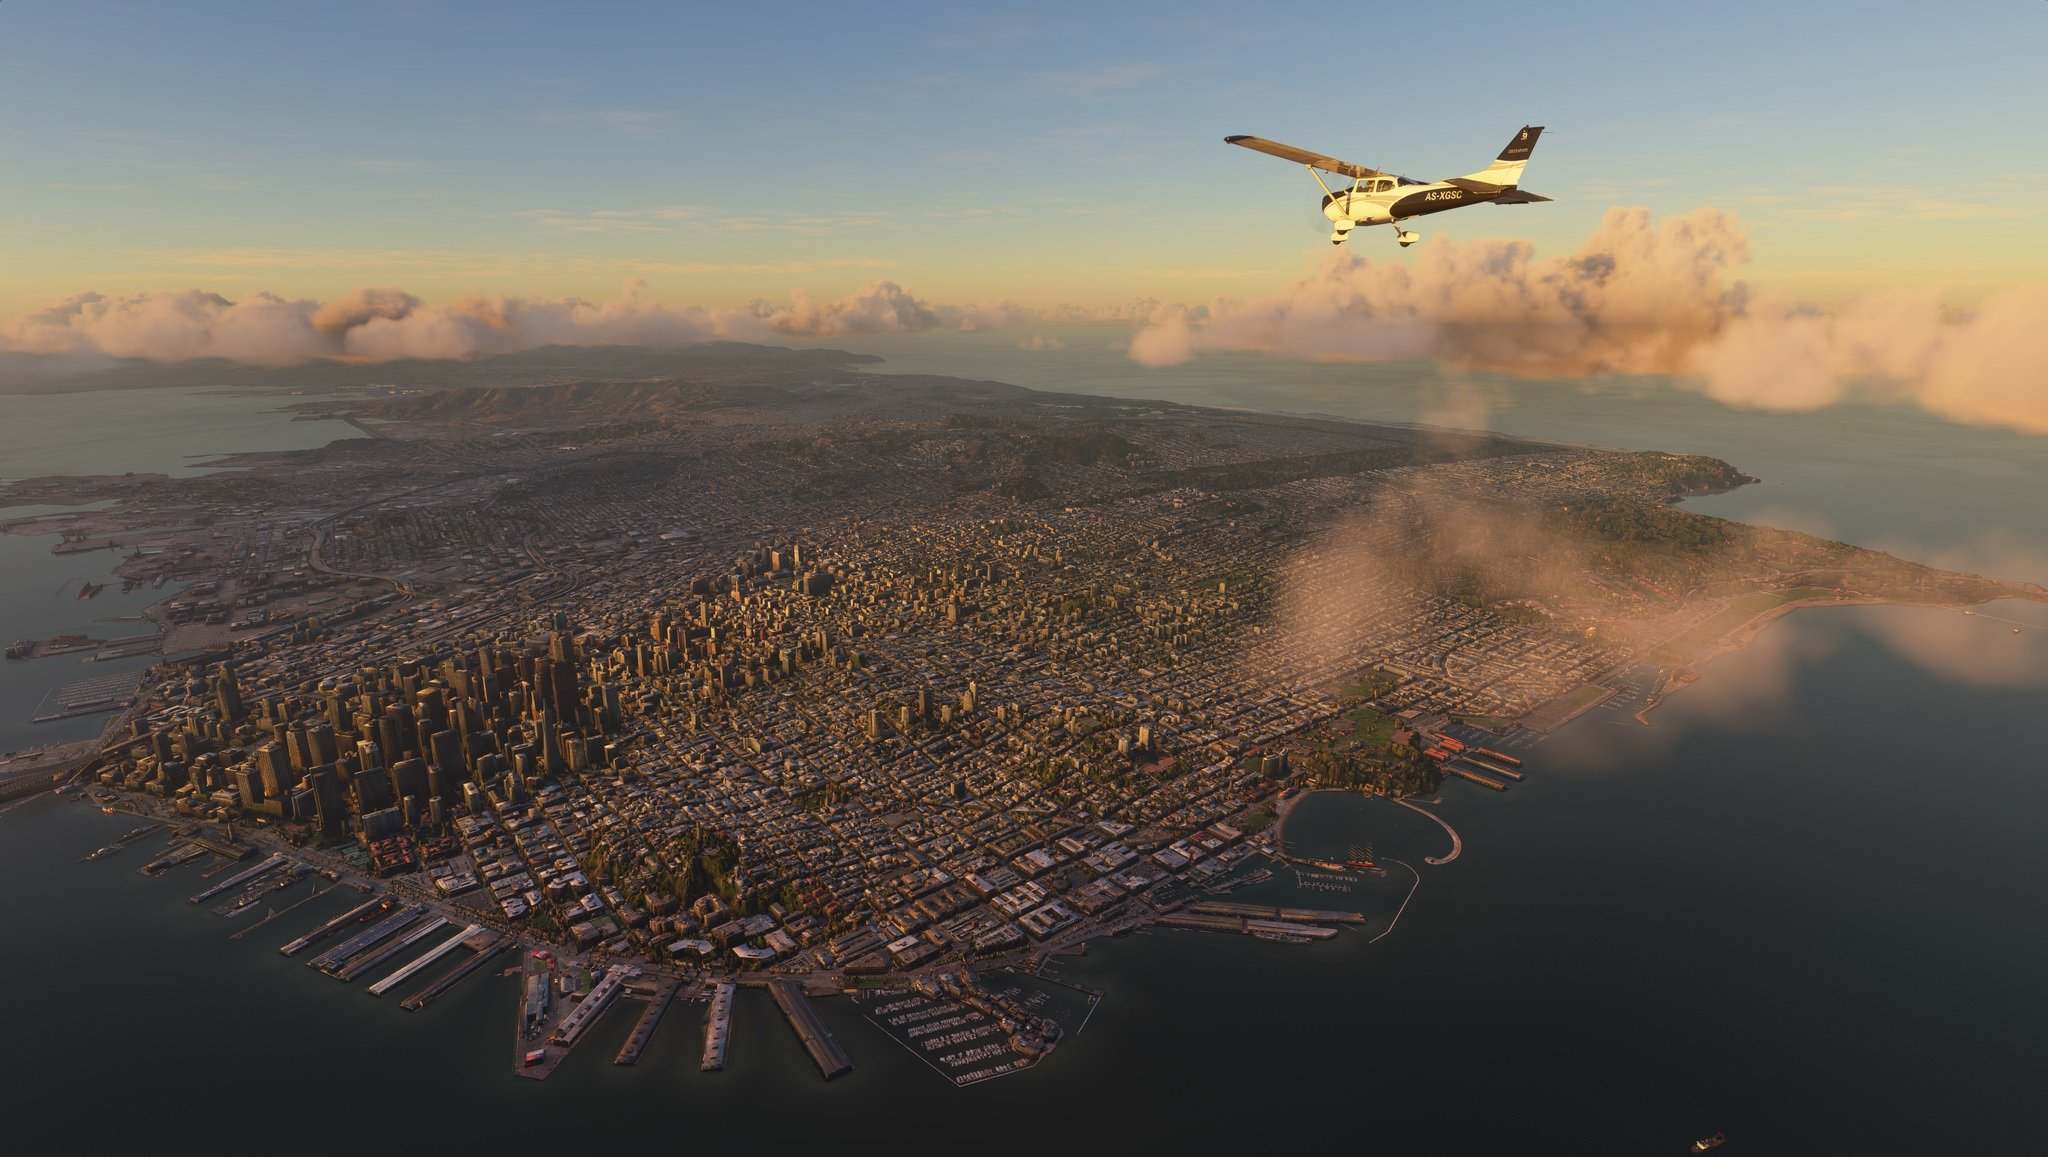 Microsoft Flight Simulator in-engine video